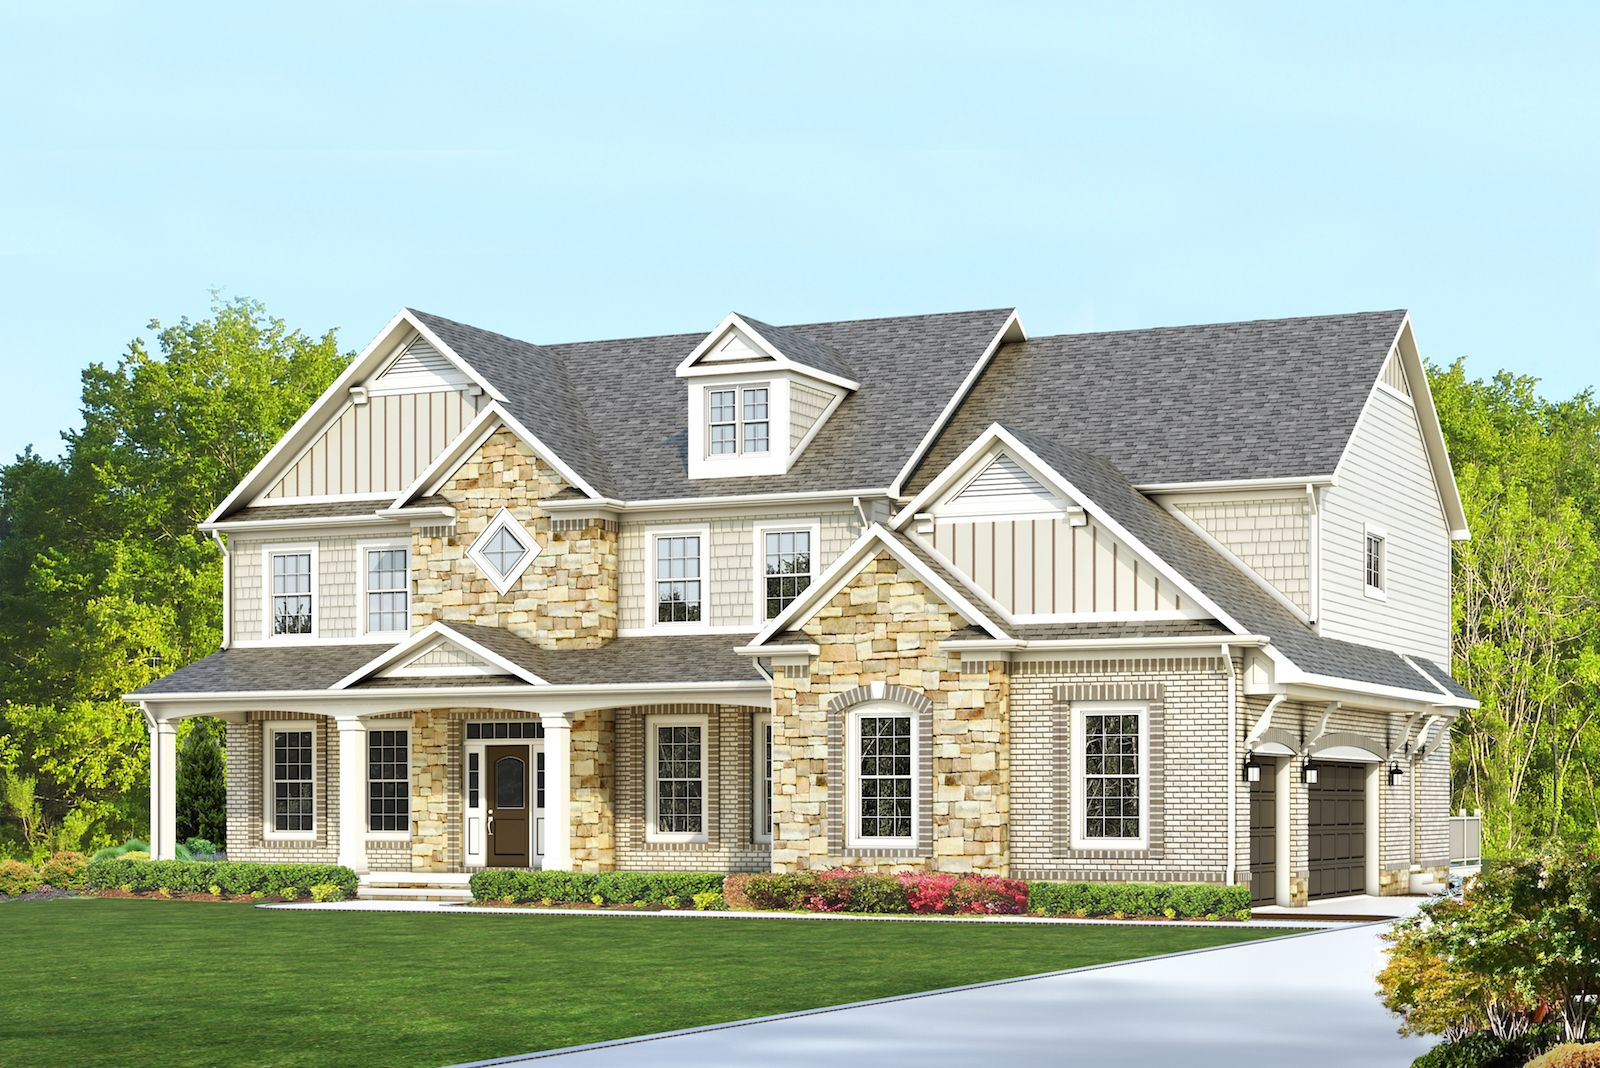 American Garage Home - 7177e8f41183dac1879407ddd570b23b_Must see American Garage Home - 7177e8f41183dac1879407ddd570b23b  Collection_859068.jpg